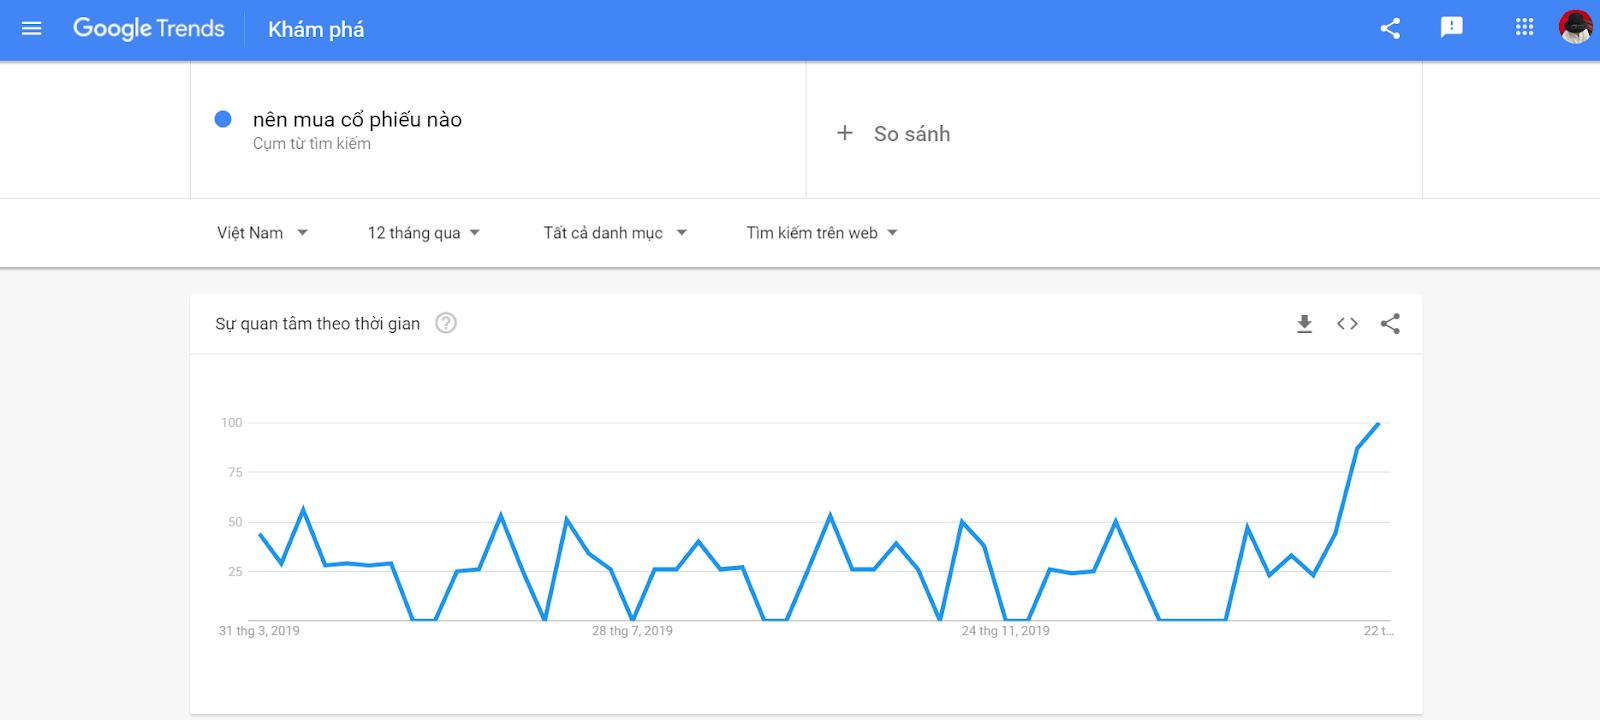 "Google trend ""nên mua cổ phiếu nào"""